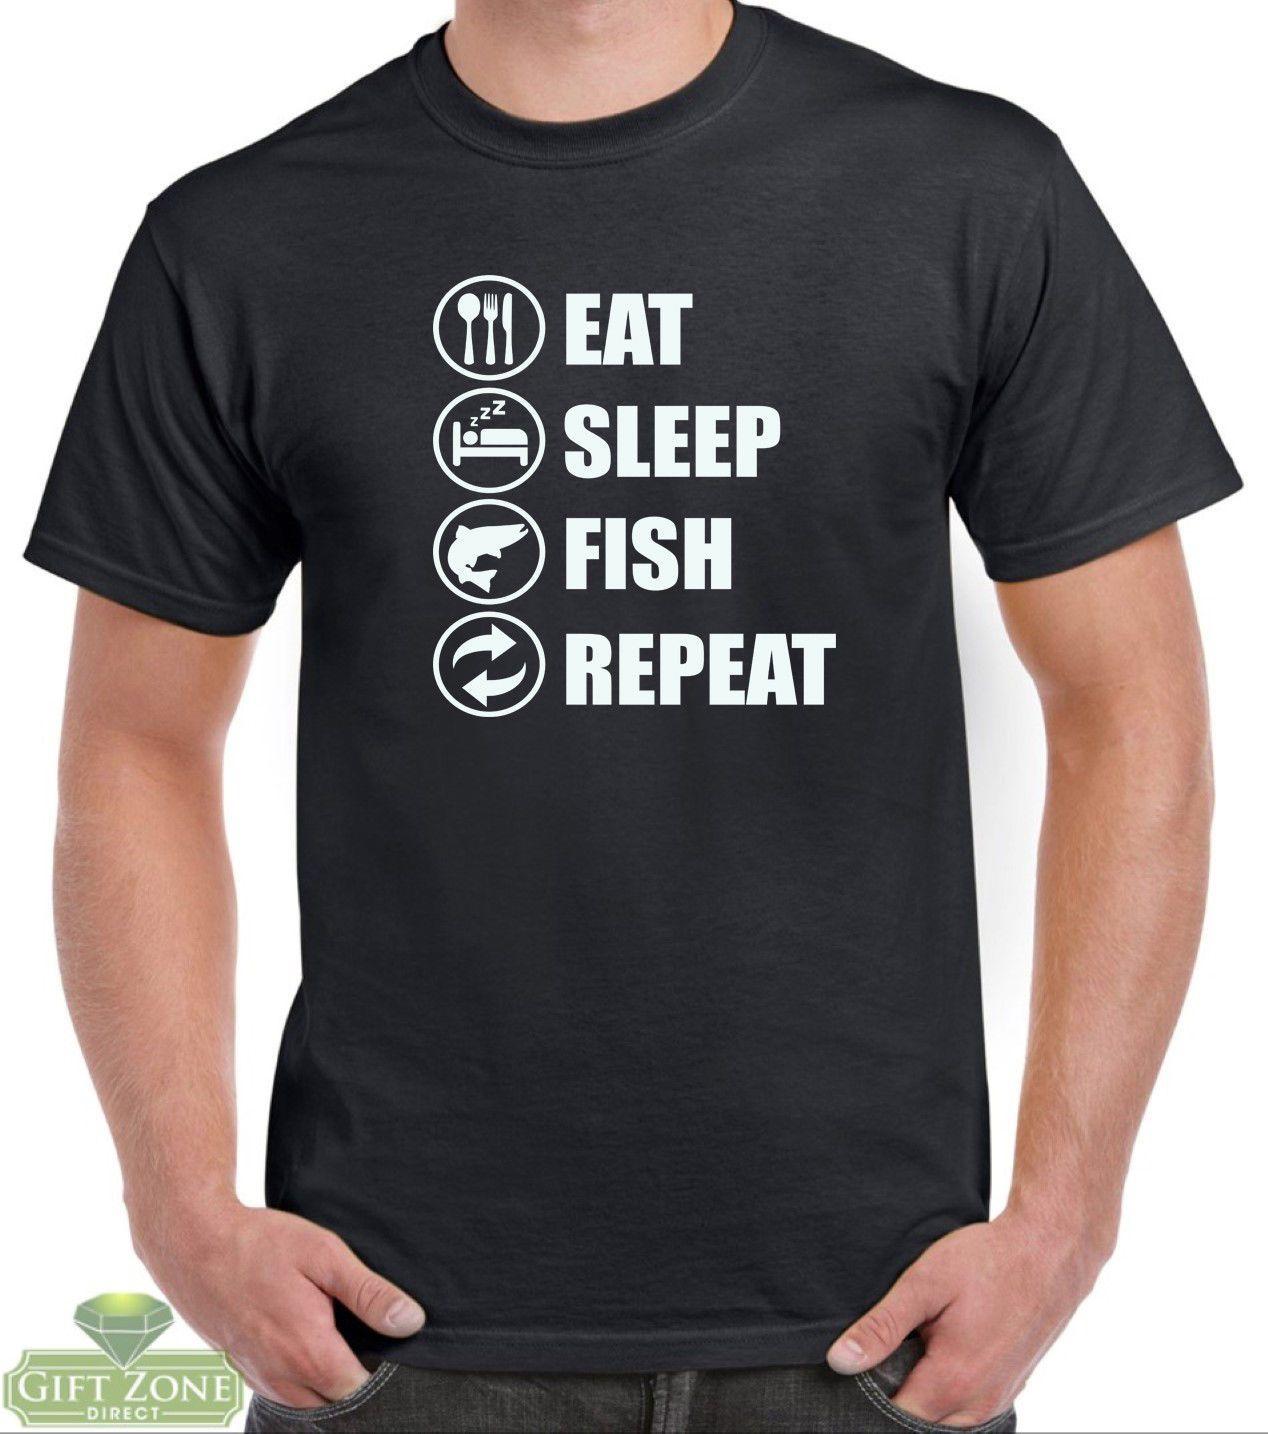 cf70431f Eat Sleep Fish Repeat Funny Fishing T Shirt Fisherman Gift Funny Unisex  Casual Tshirt Funny T Shirts For Men Make T Shirts From Buyfriendly,  $12.96| DHgate.